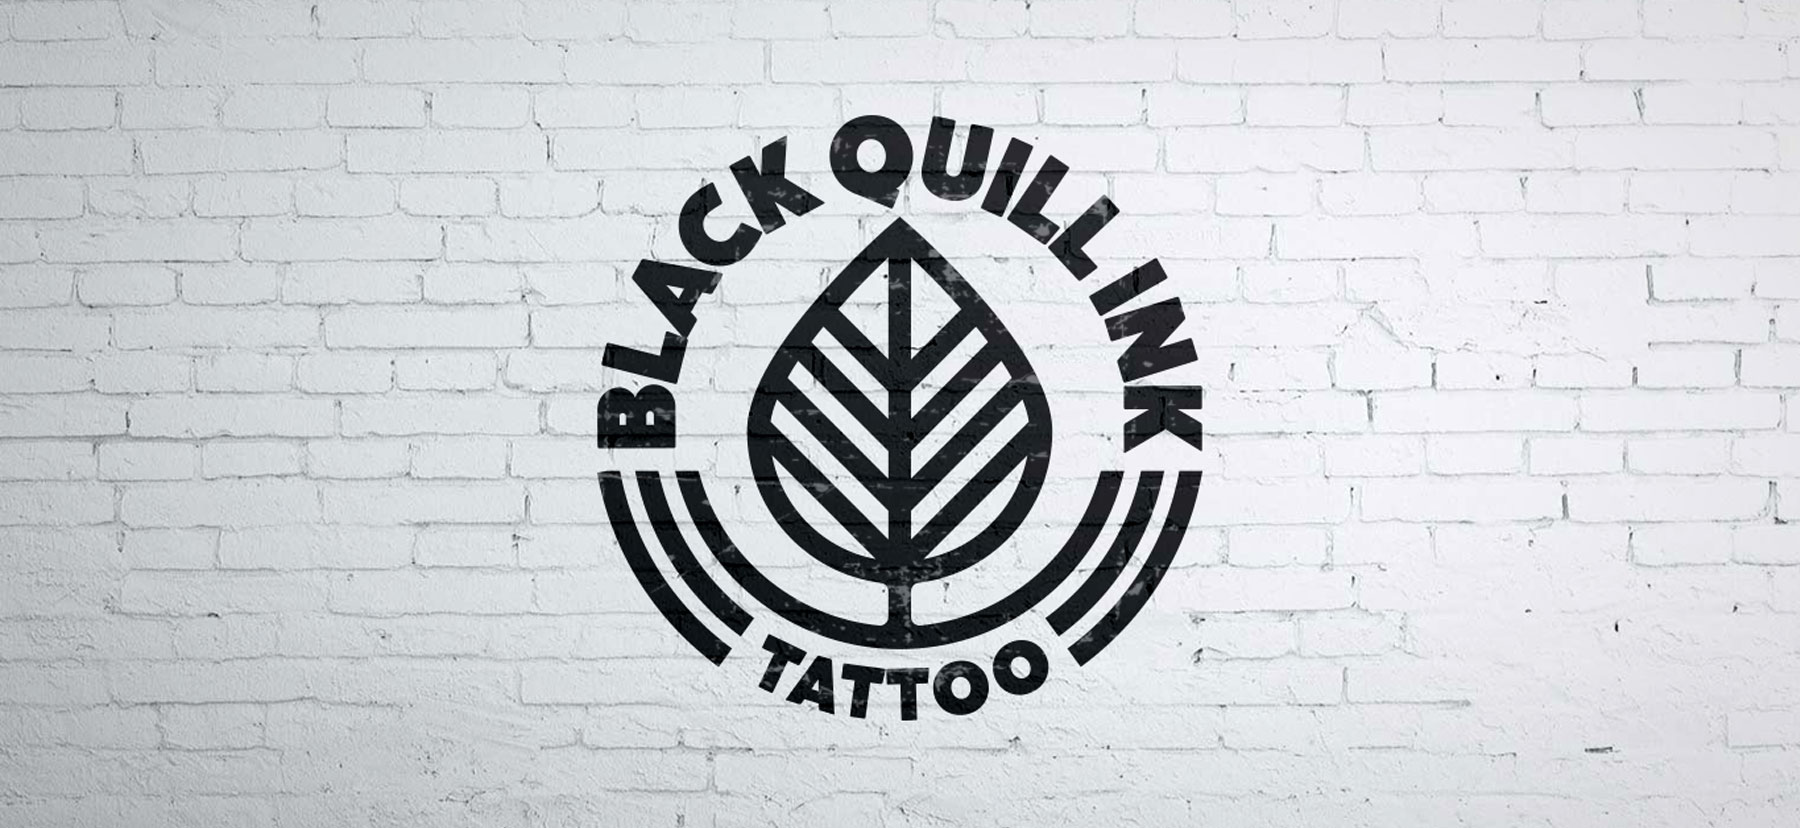 blackquill_wall.jpg